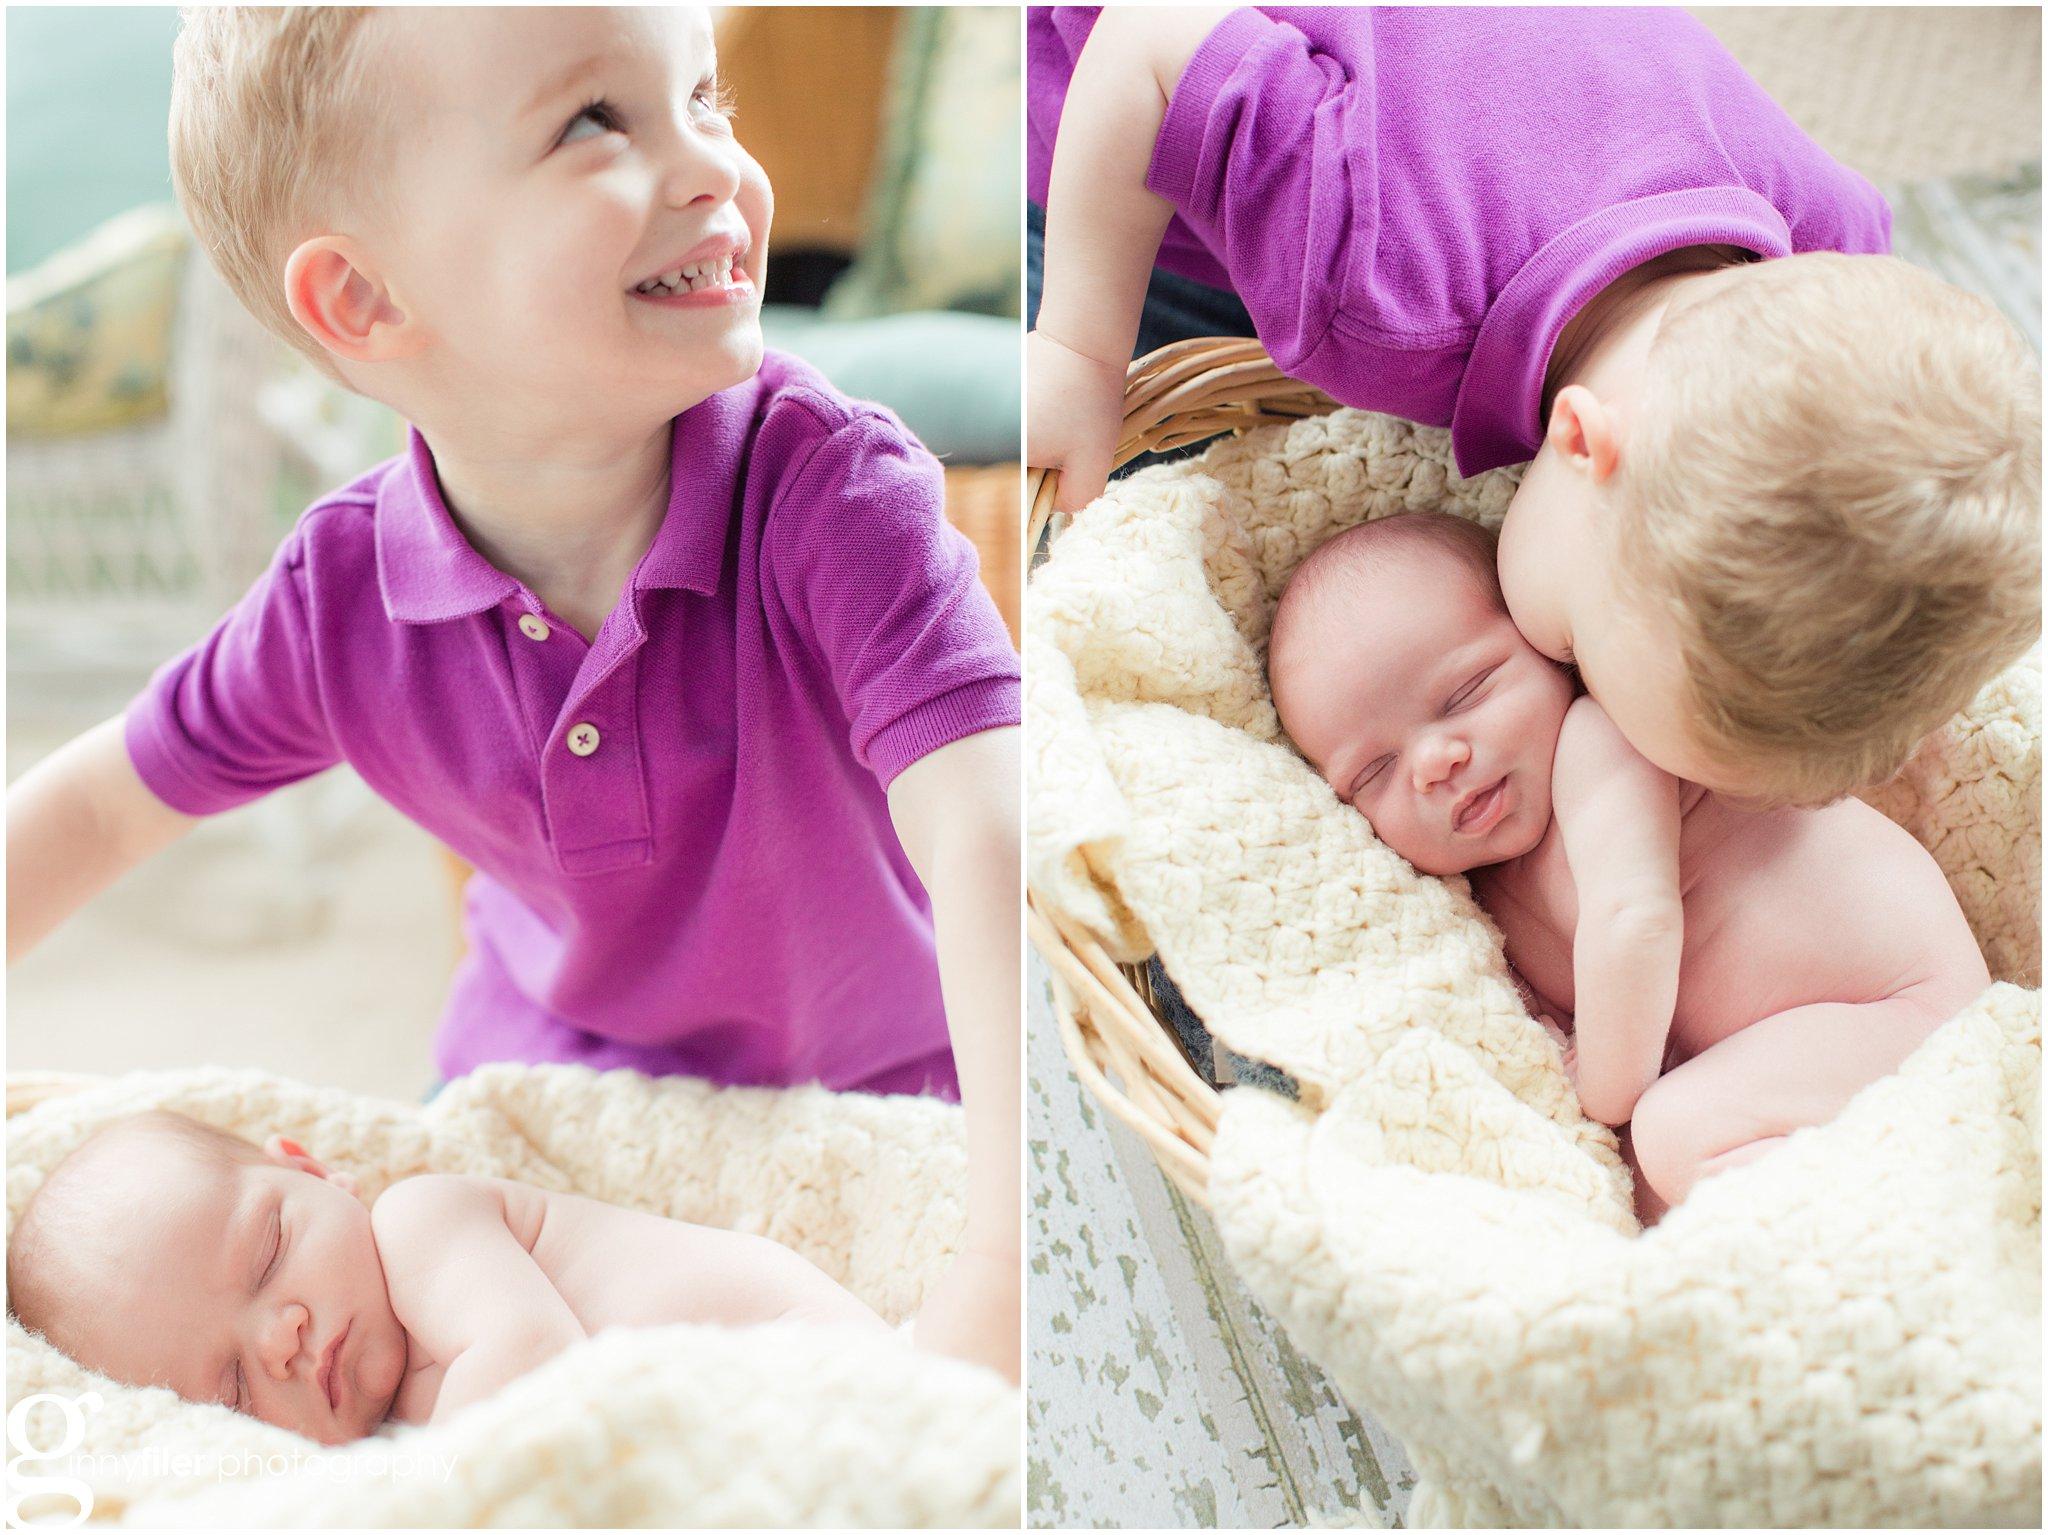 newborn_baby_boy_photography_blue_0021.jpg